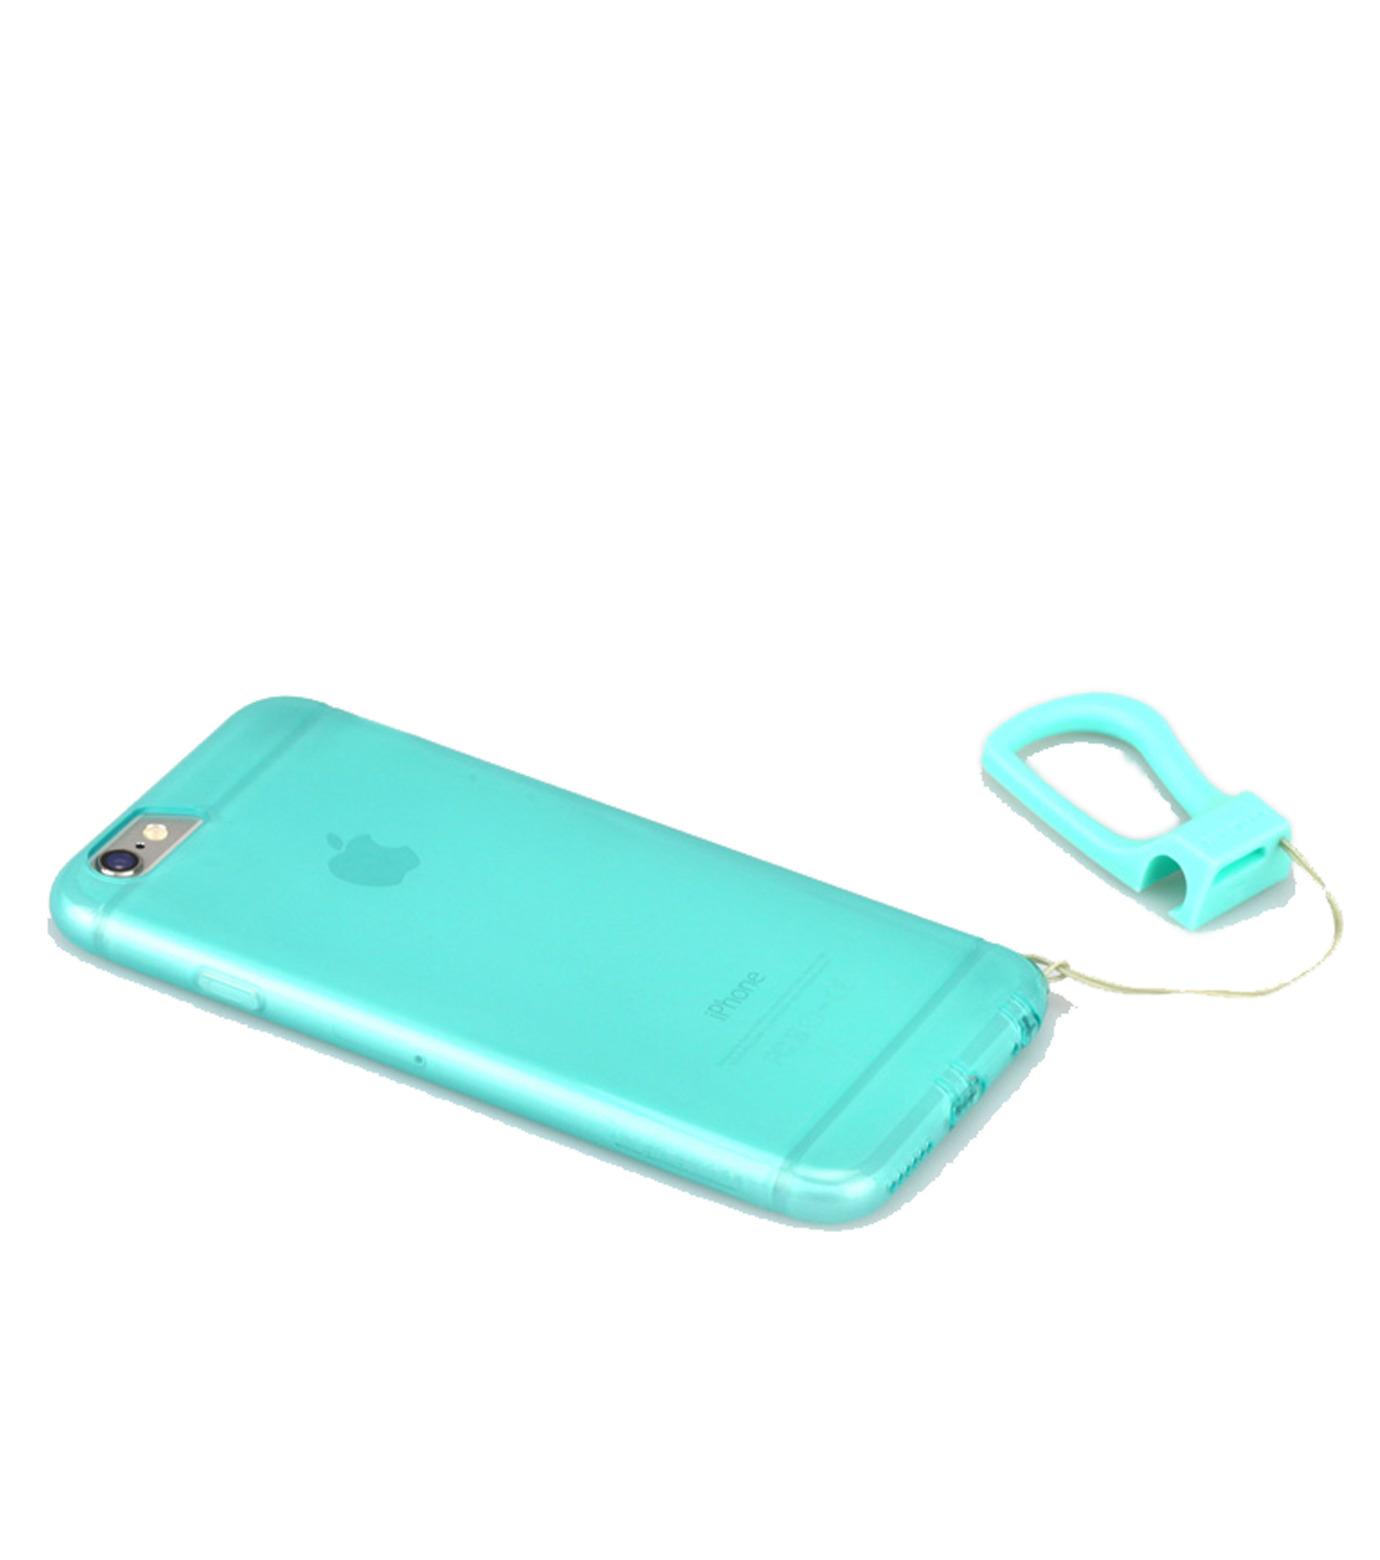 Tunewear(チューンウエア)のsoftshell 6/6s-CHARCHOL GRAY(ケースiphone6/6s/case iphone6/6s)-TUN-PH-0399-12 拡大詳細画像3